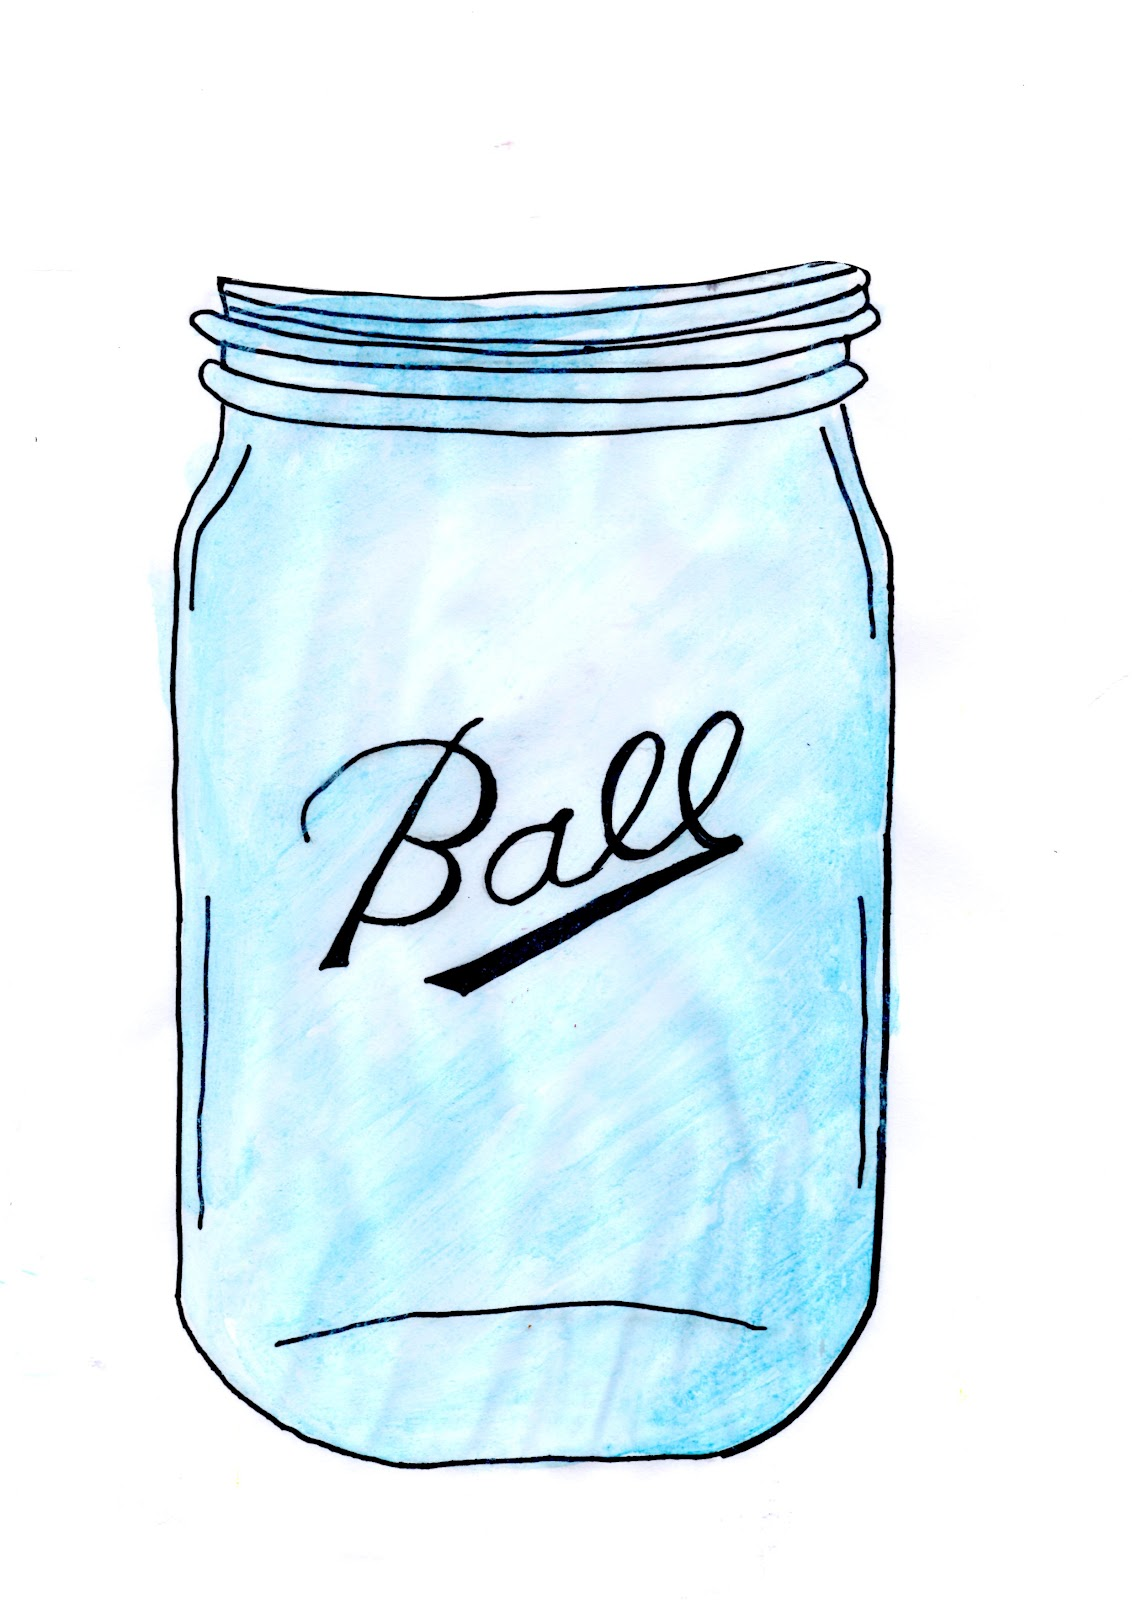 Ball jar clipart.